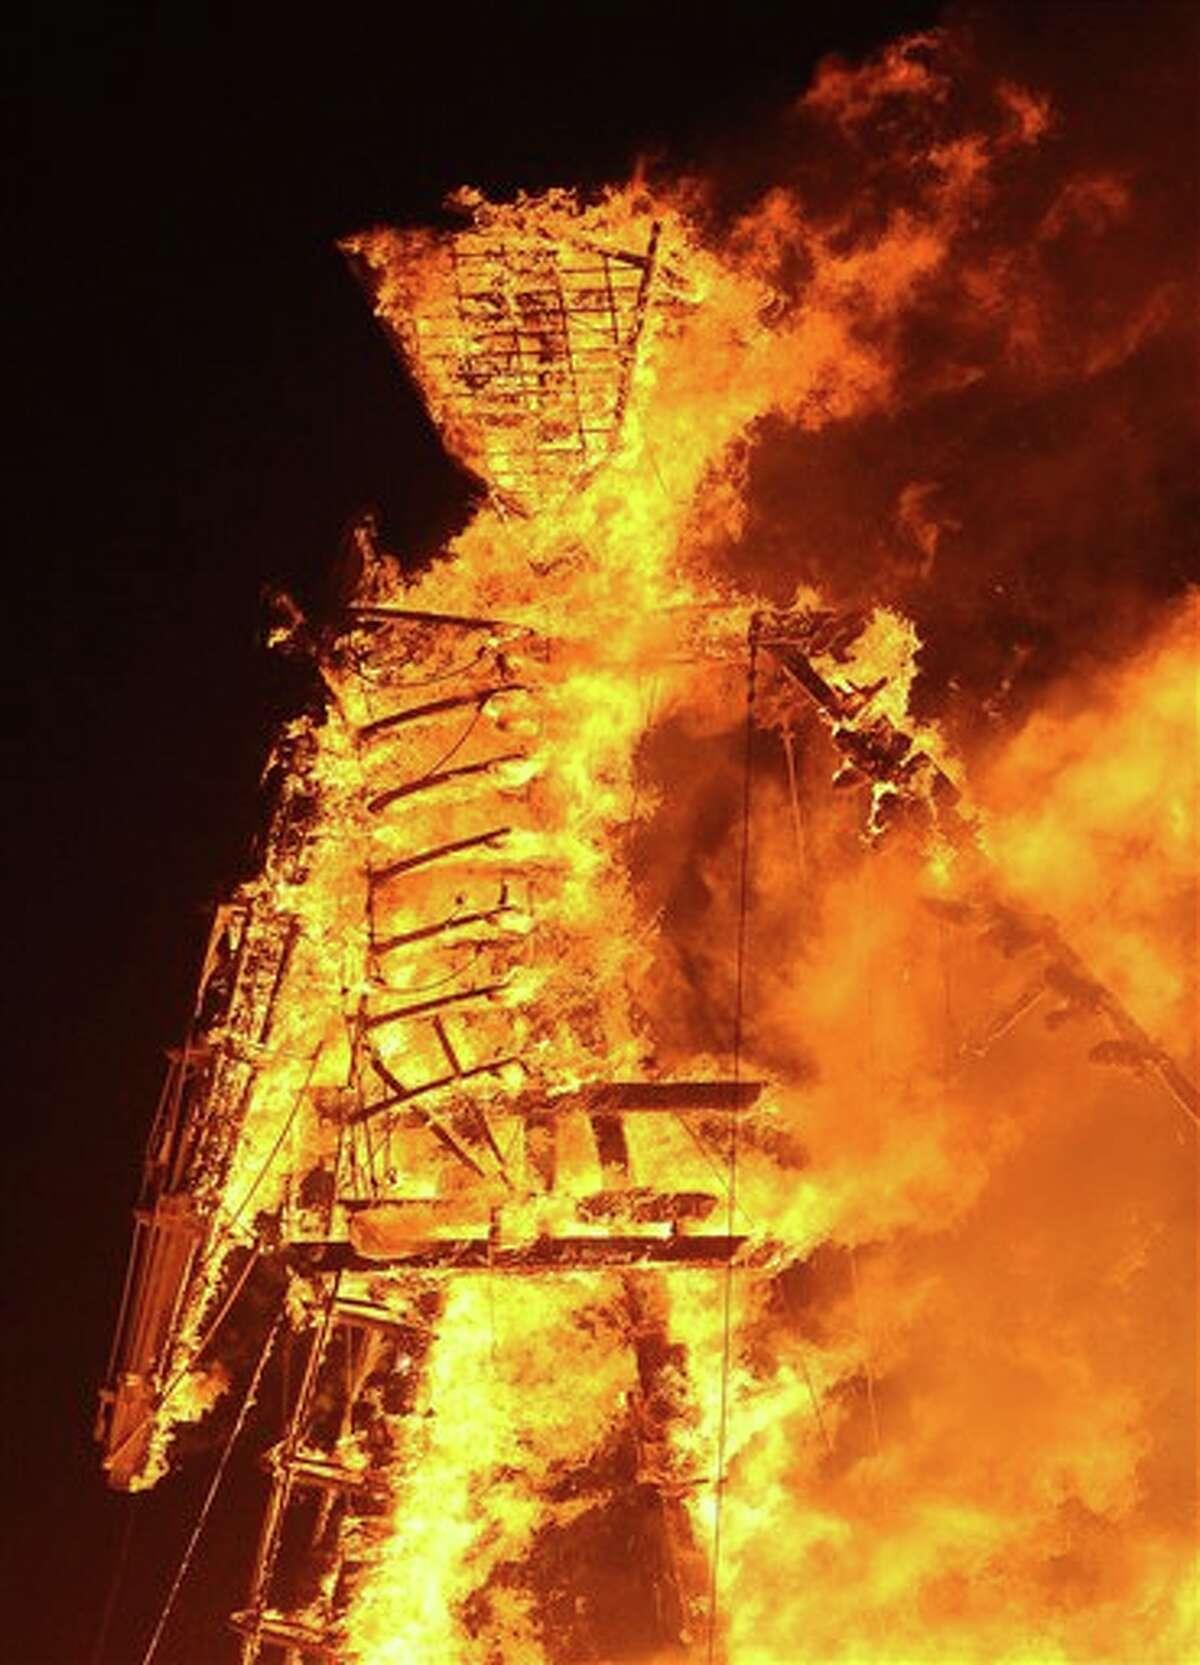 The Man burns on the playa at Burning Man on the Black Rock Desert near Gerlach, Nev. on Friday August 31, 2012.